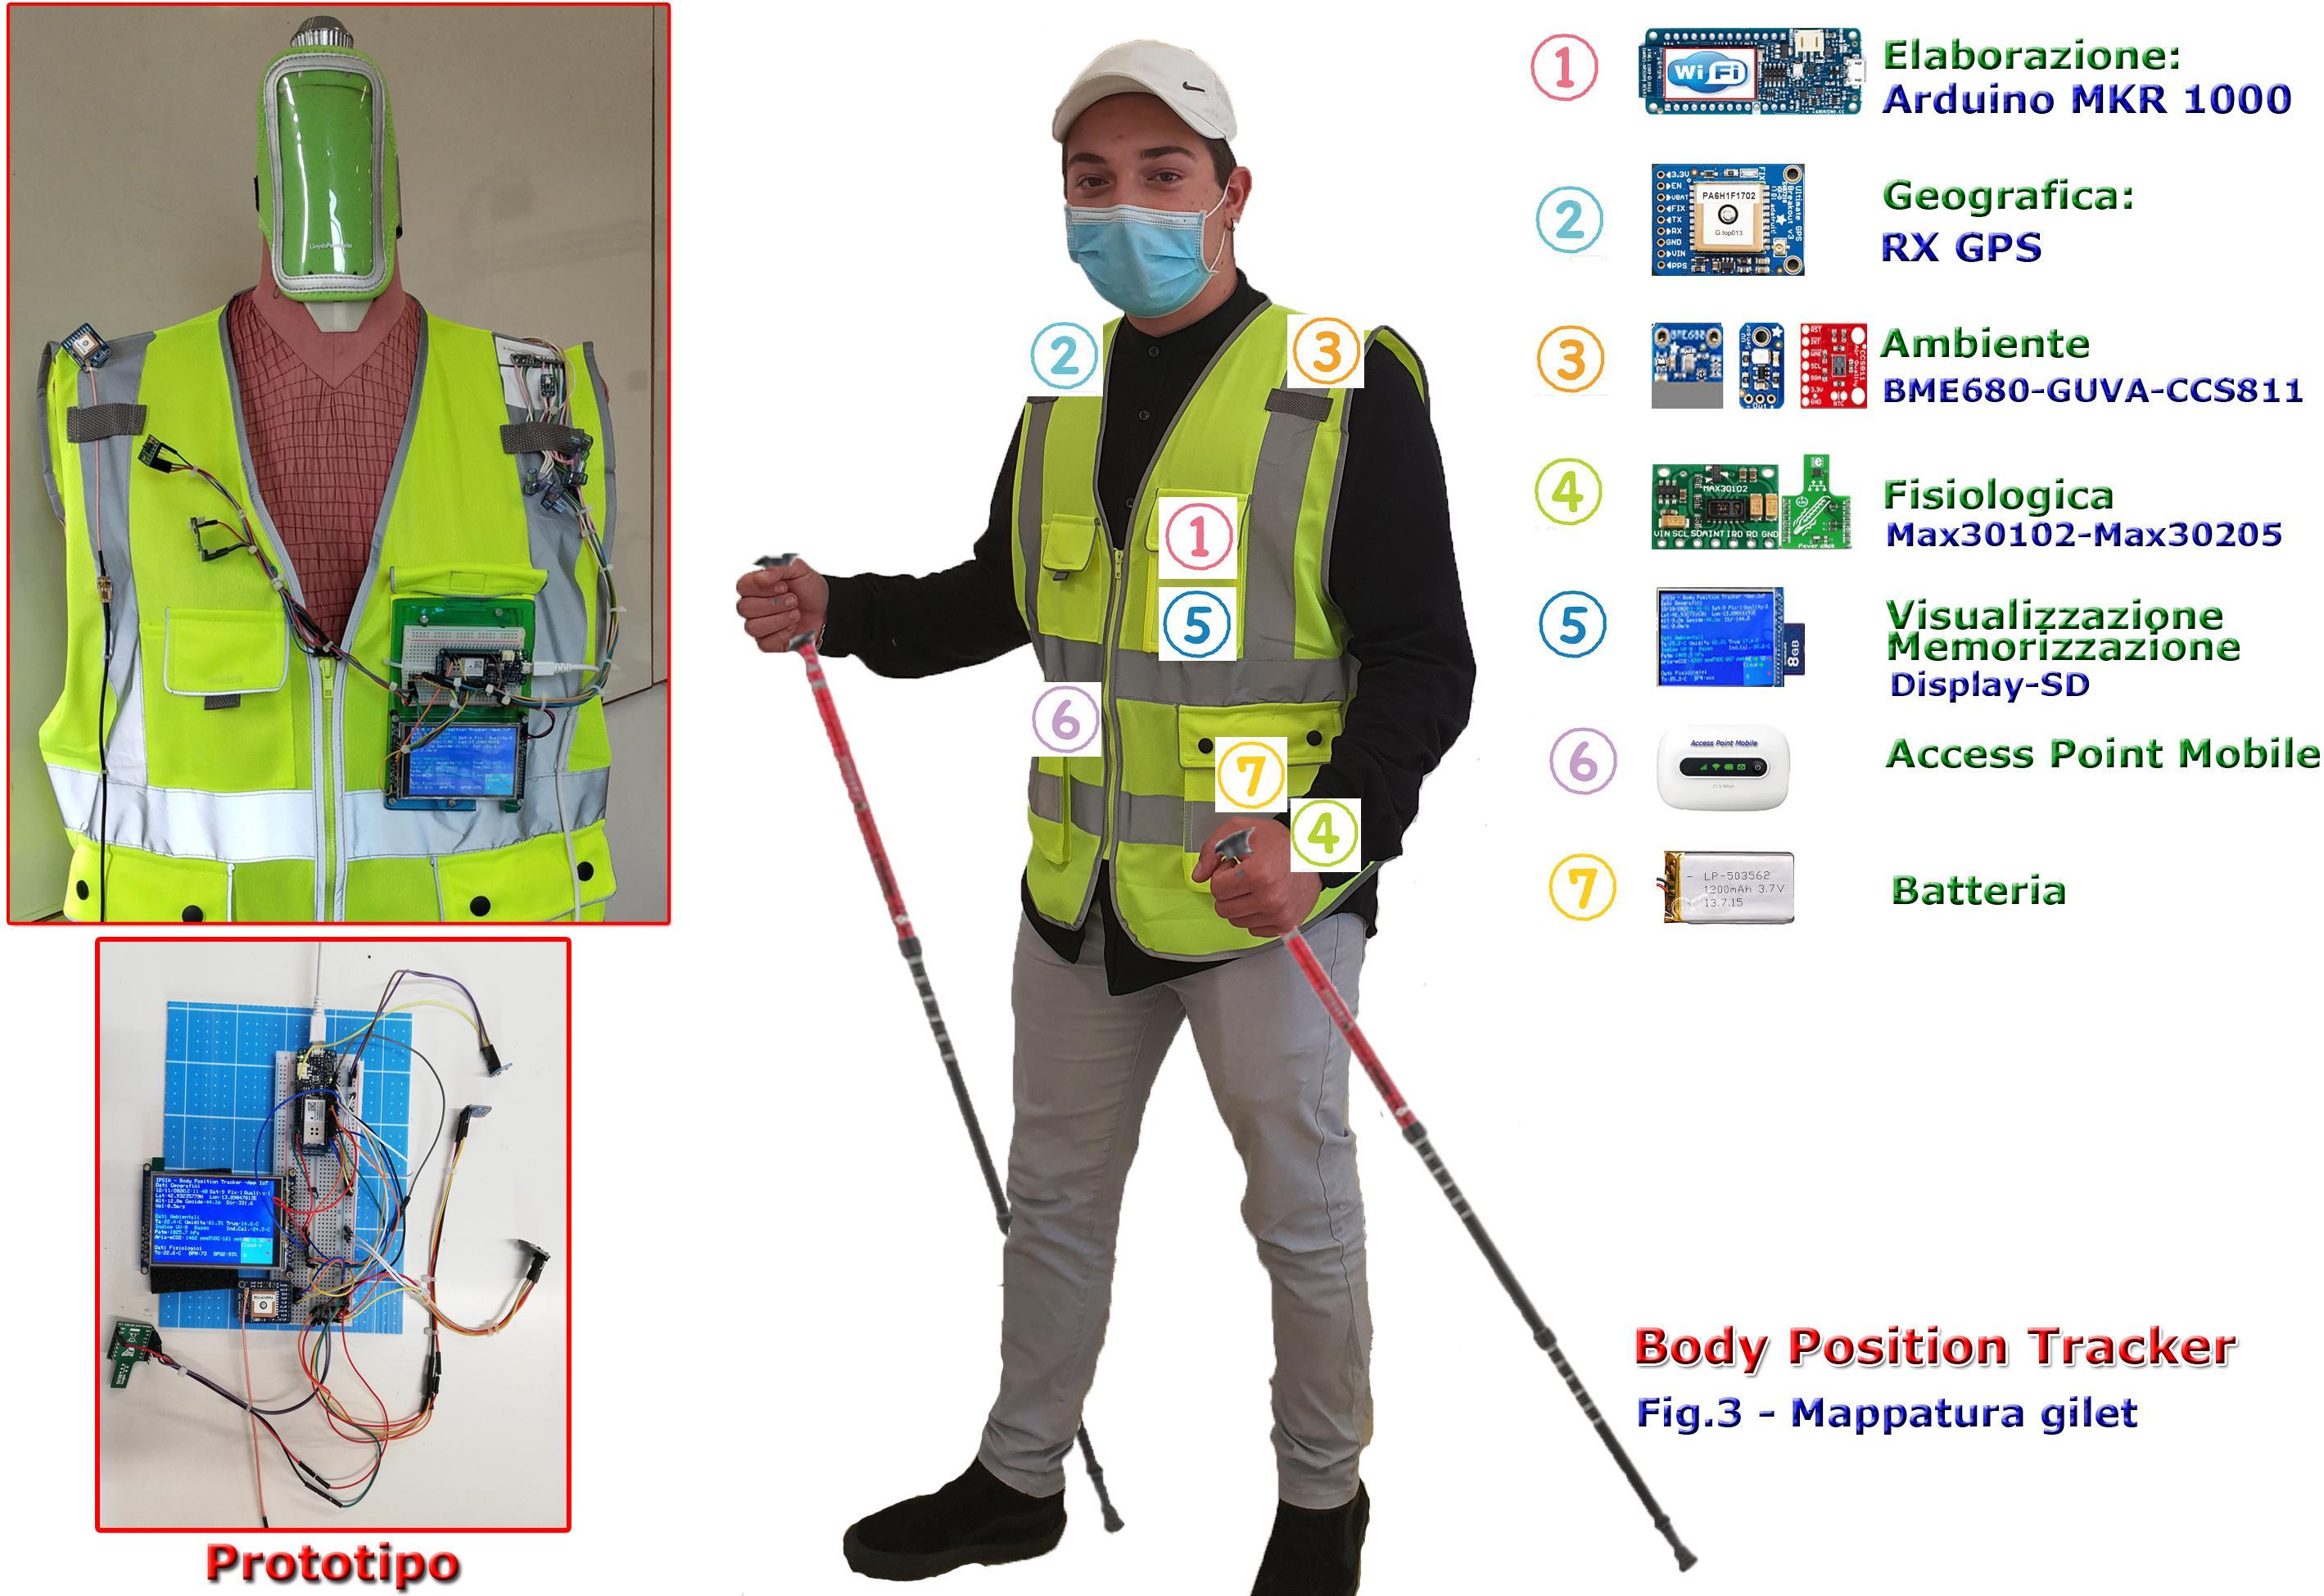 Body Position Tracker - Applicazione indossabile IoT